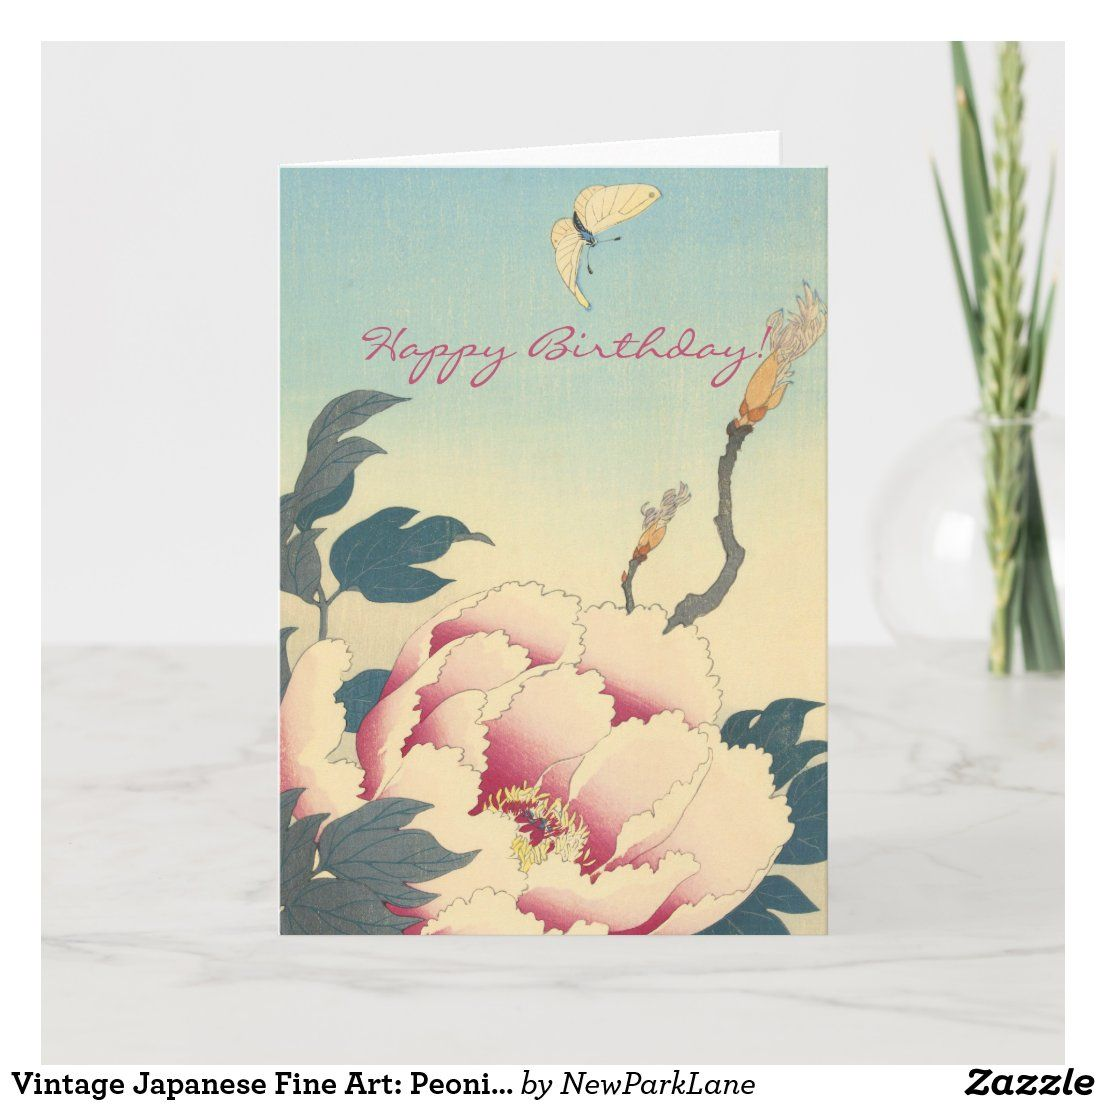 Vintage Japanese Fine Art Peonies Birthday Card Zazzle Com In 2020 Vintage Japanese Birthday Postcards Art Birthday